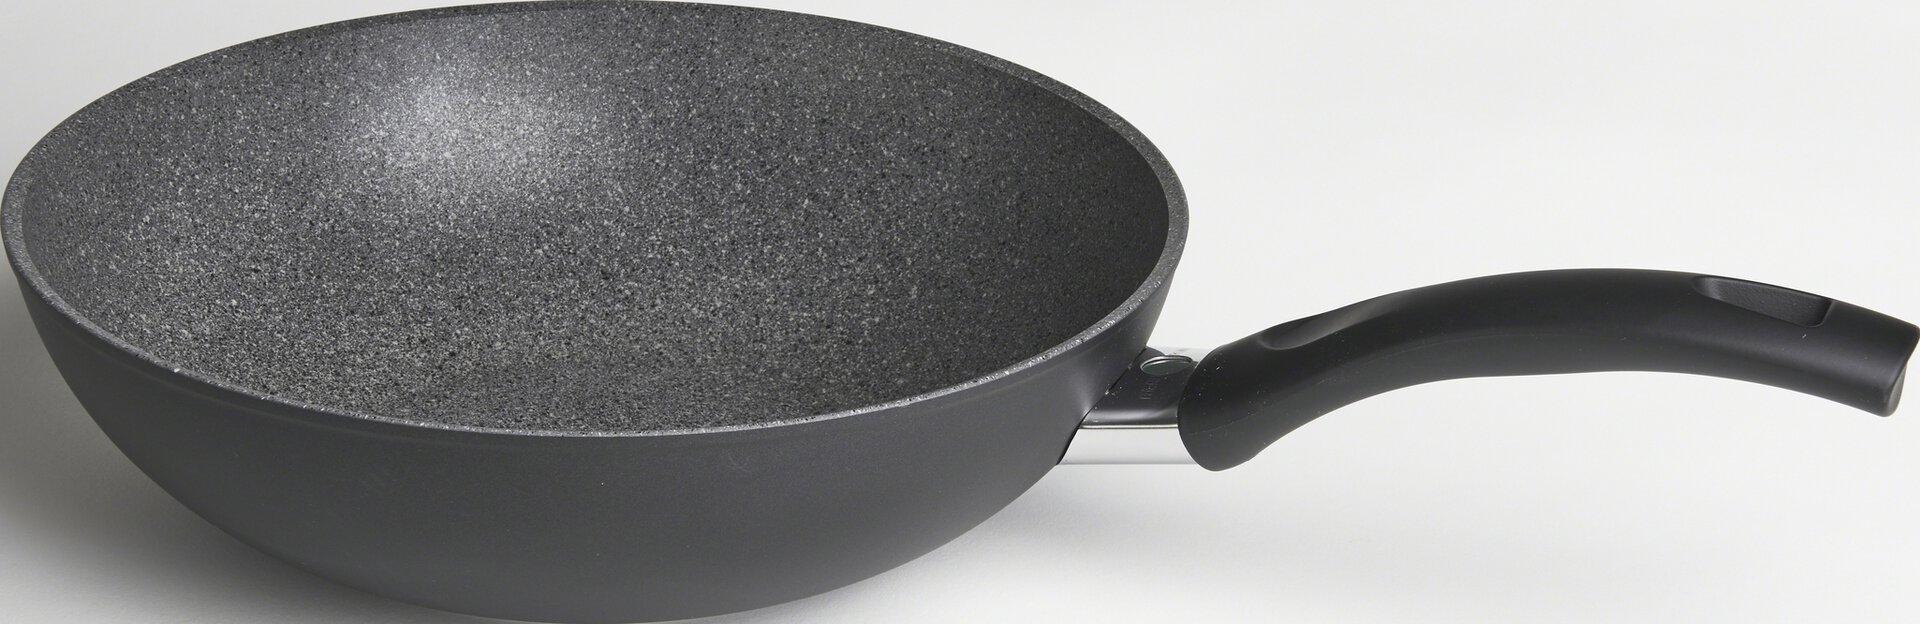 Pfanne Bari Granitium Ballarini Metall grau